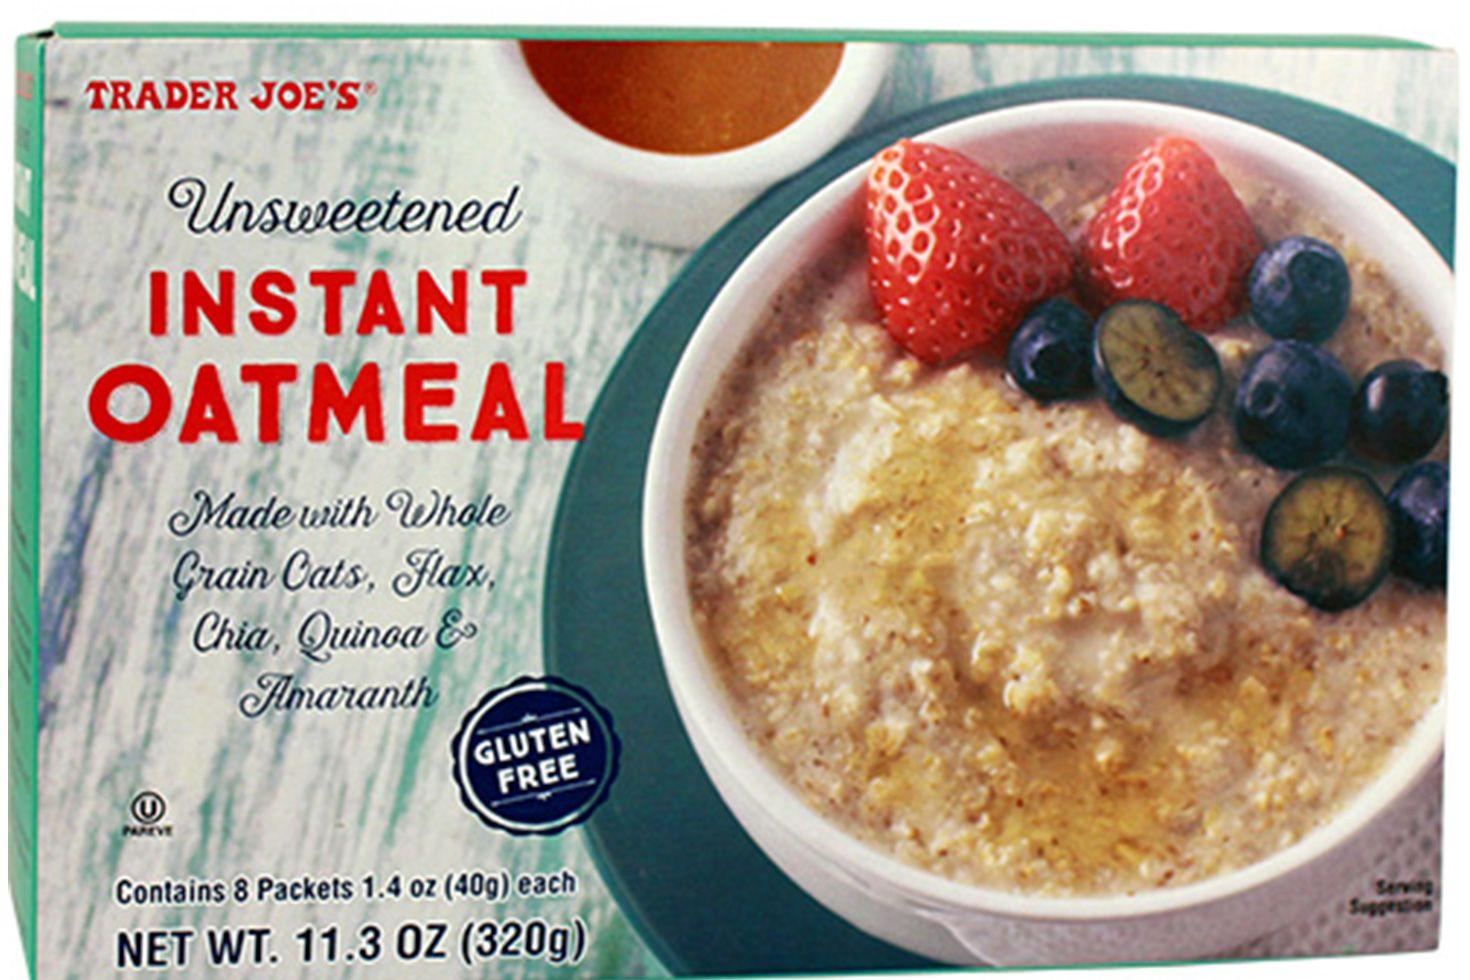 Trader Joe's Unsweetened Instant Oatmeal